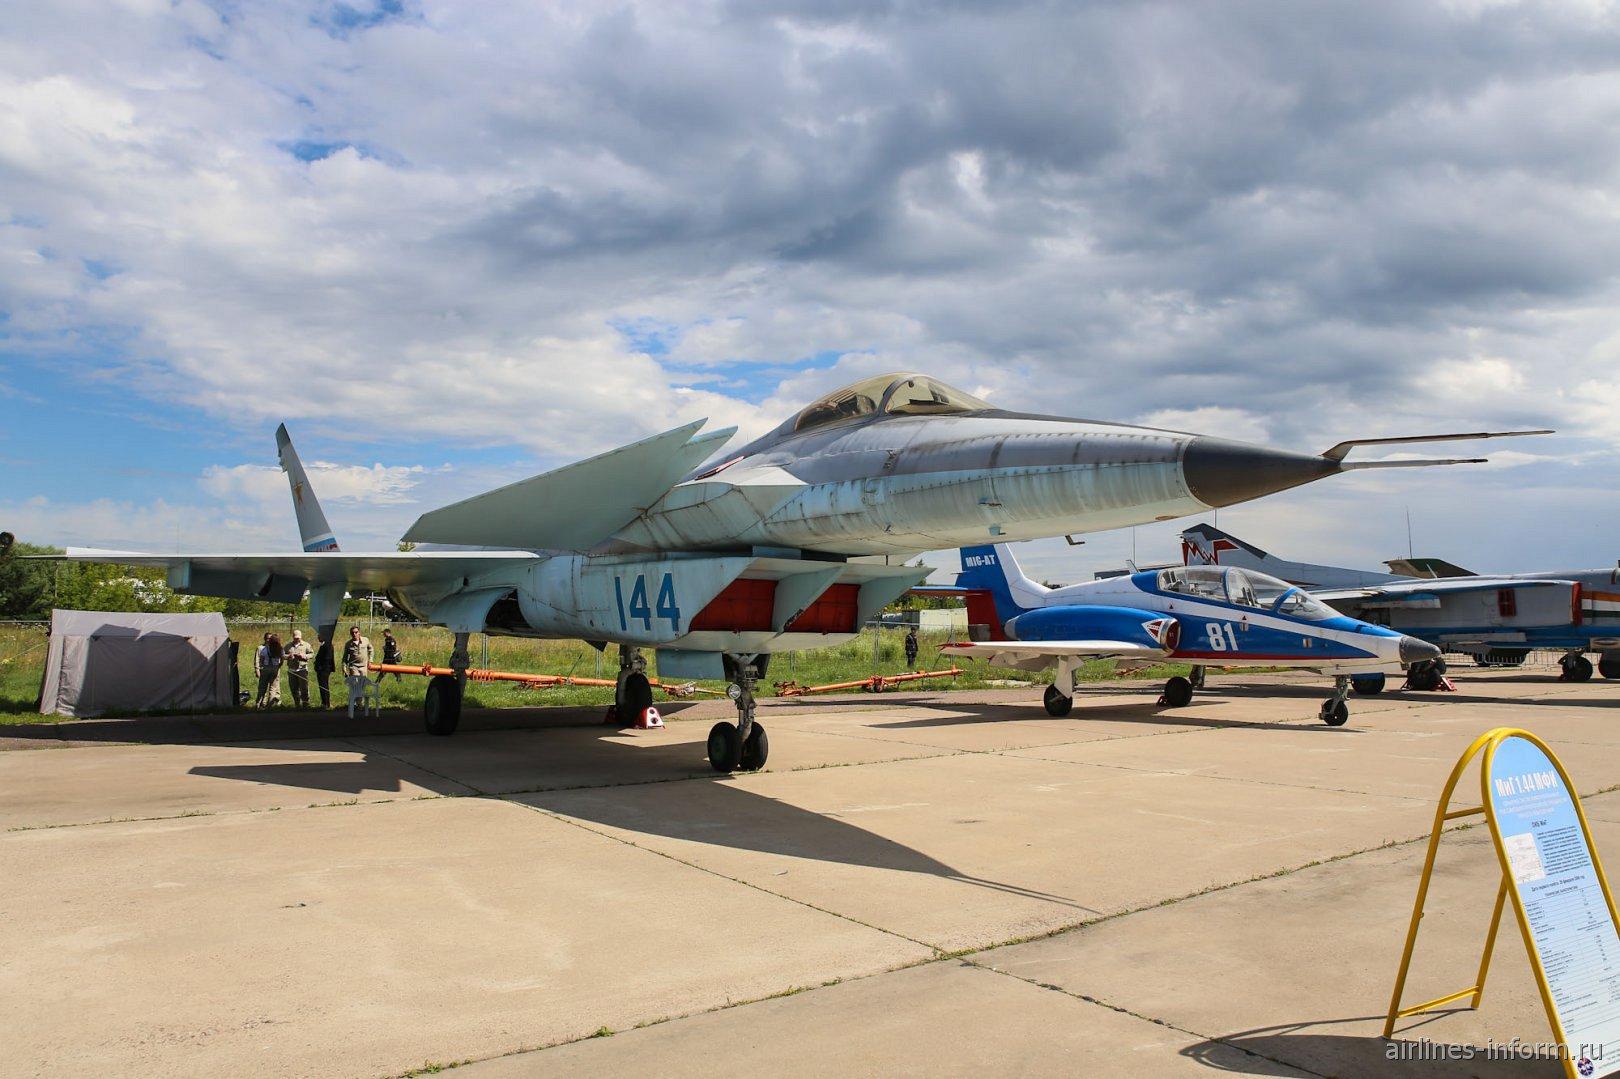 Истребитель МиГ-1.44 на авиасалоне МАКС-2017